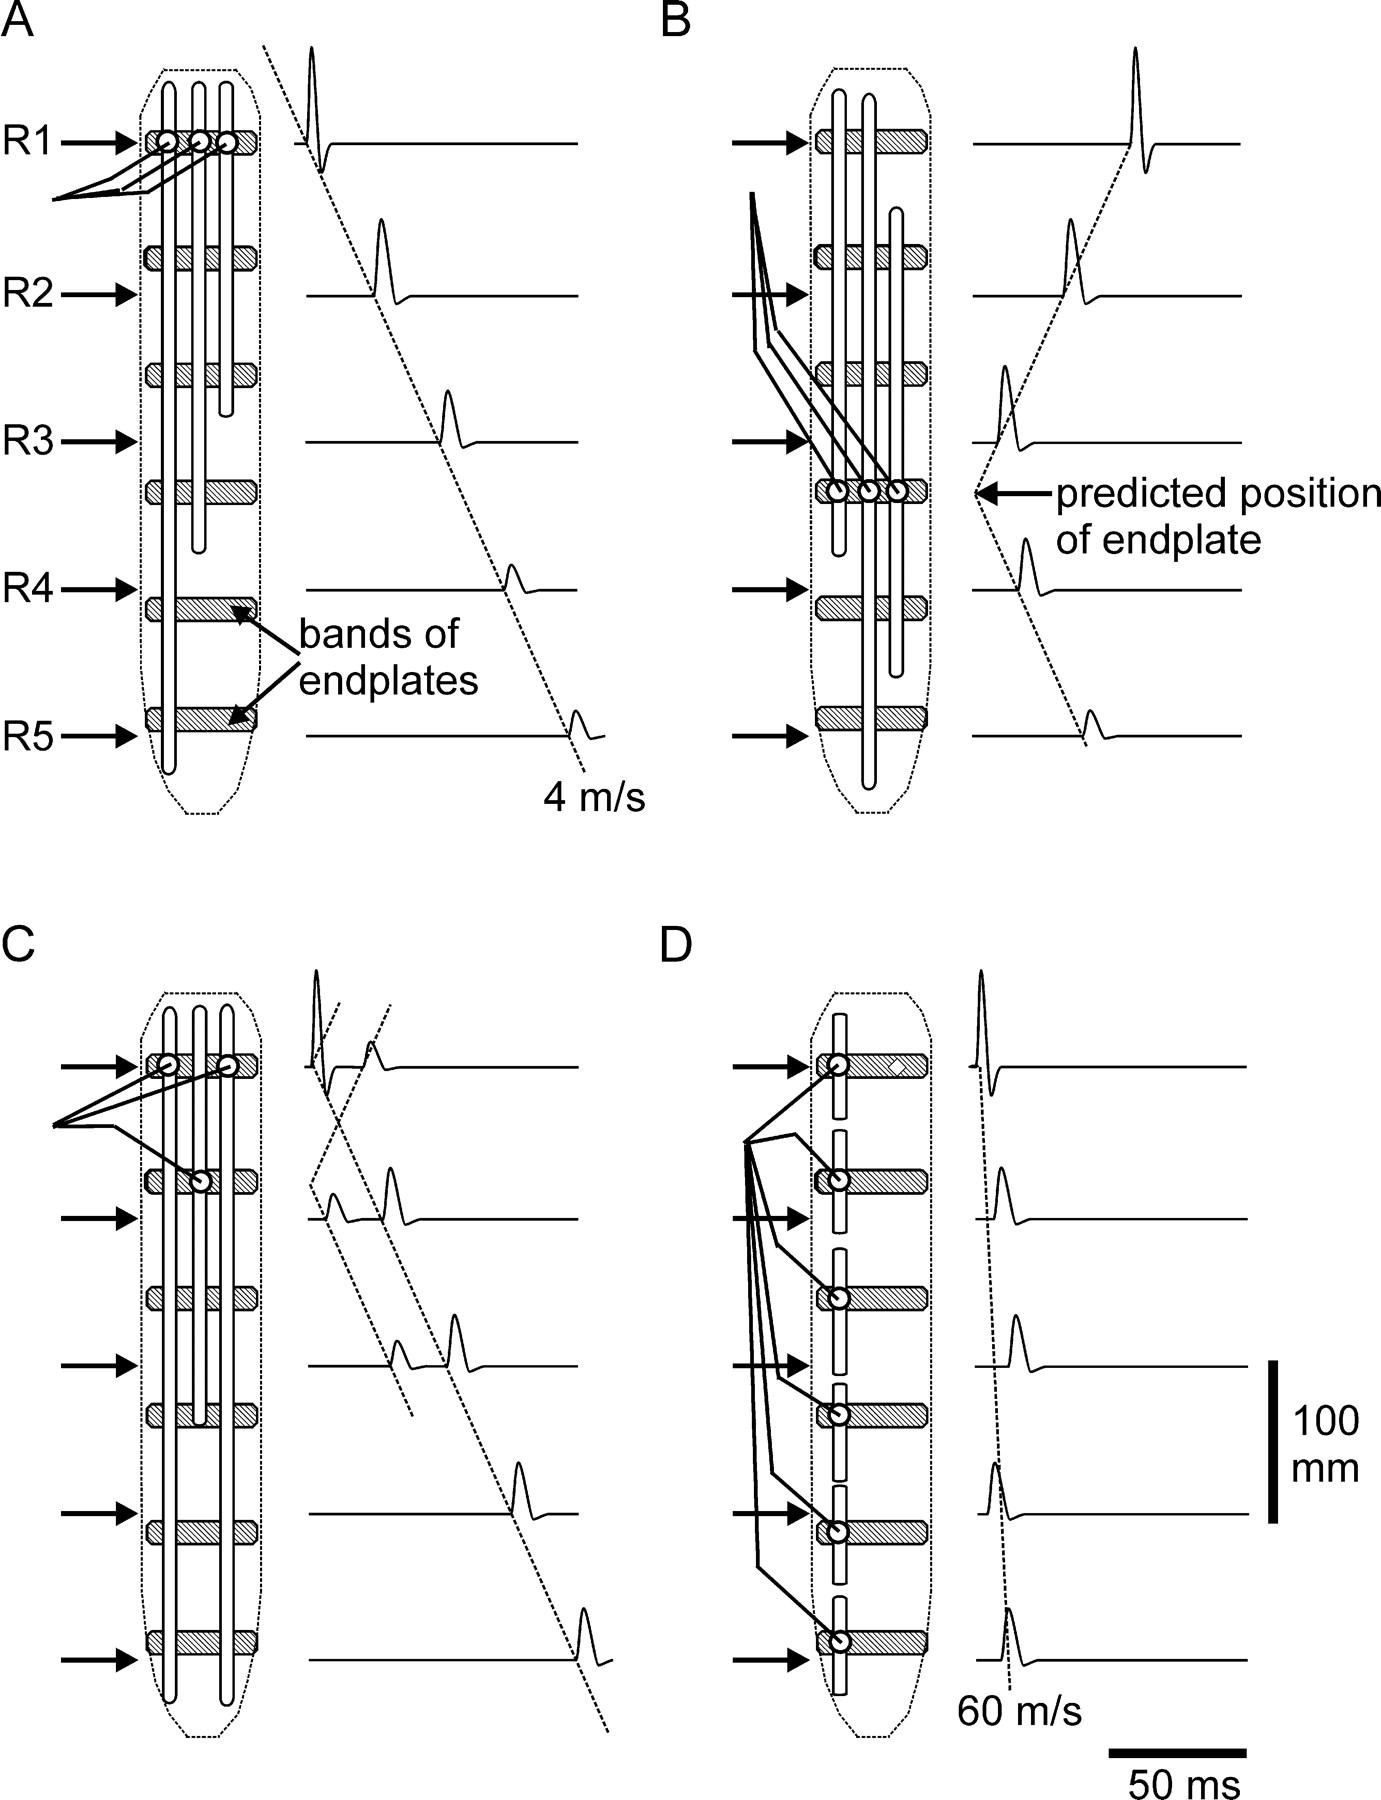 Muscle Fiber And Motor Unit Behavior In The Longest Human Skeletal